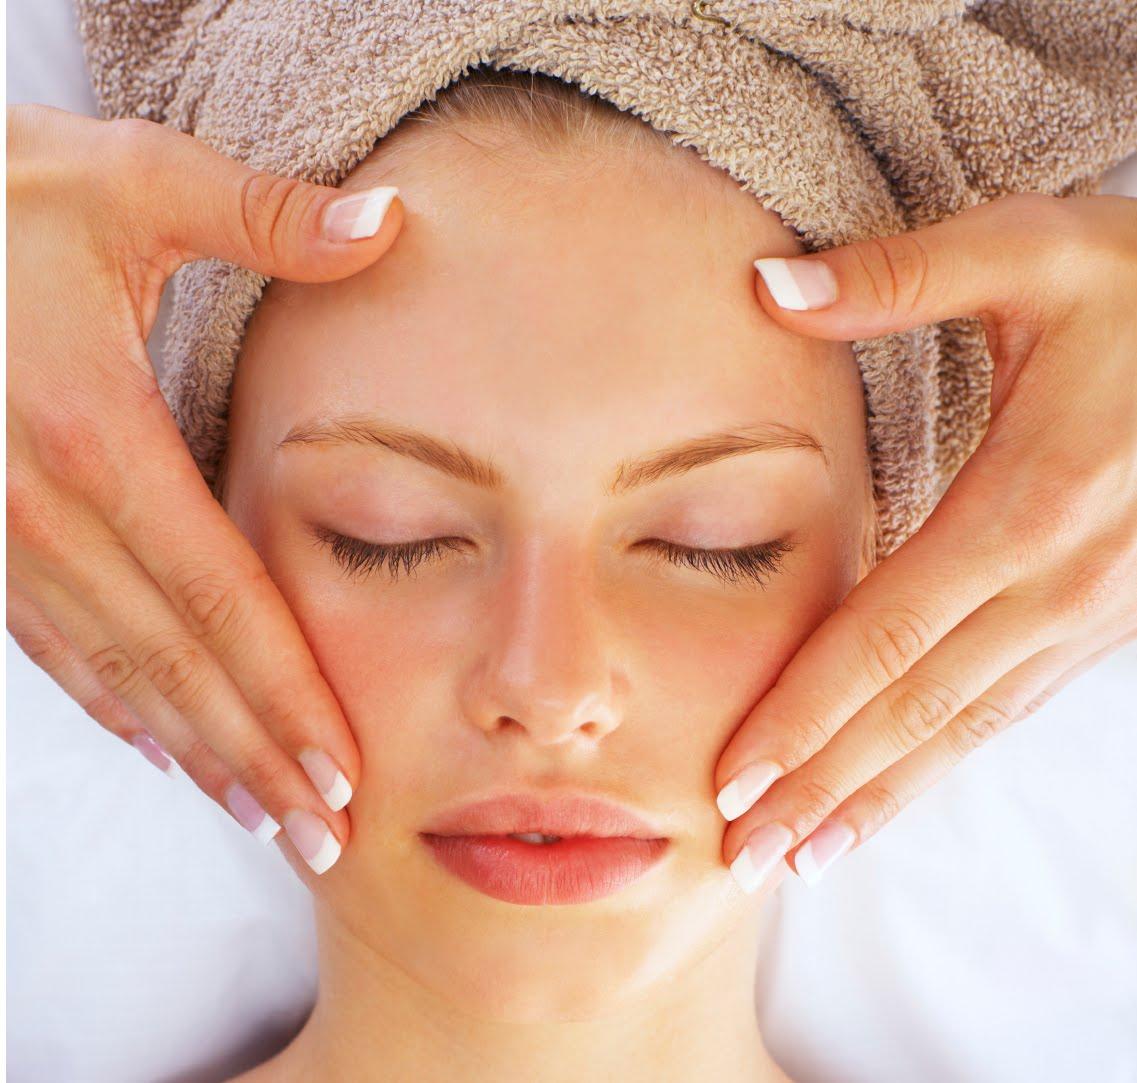 Vibrance Spa Kelowna: Benefits Of Getting A Facial